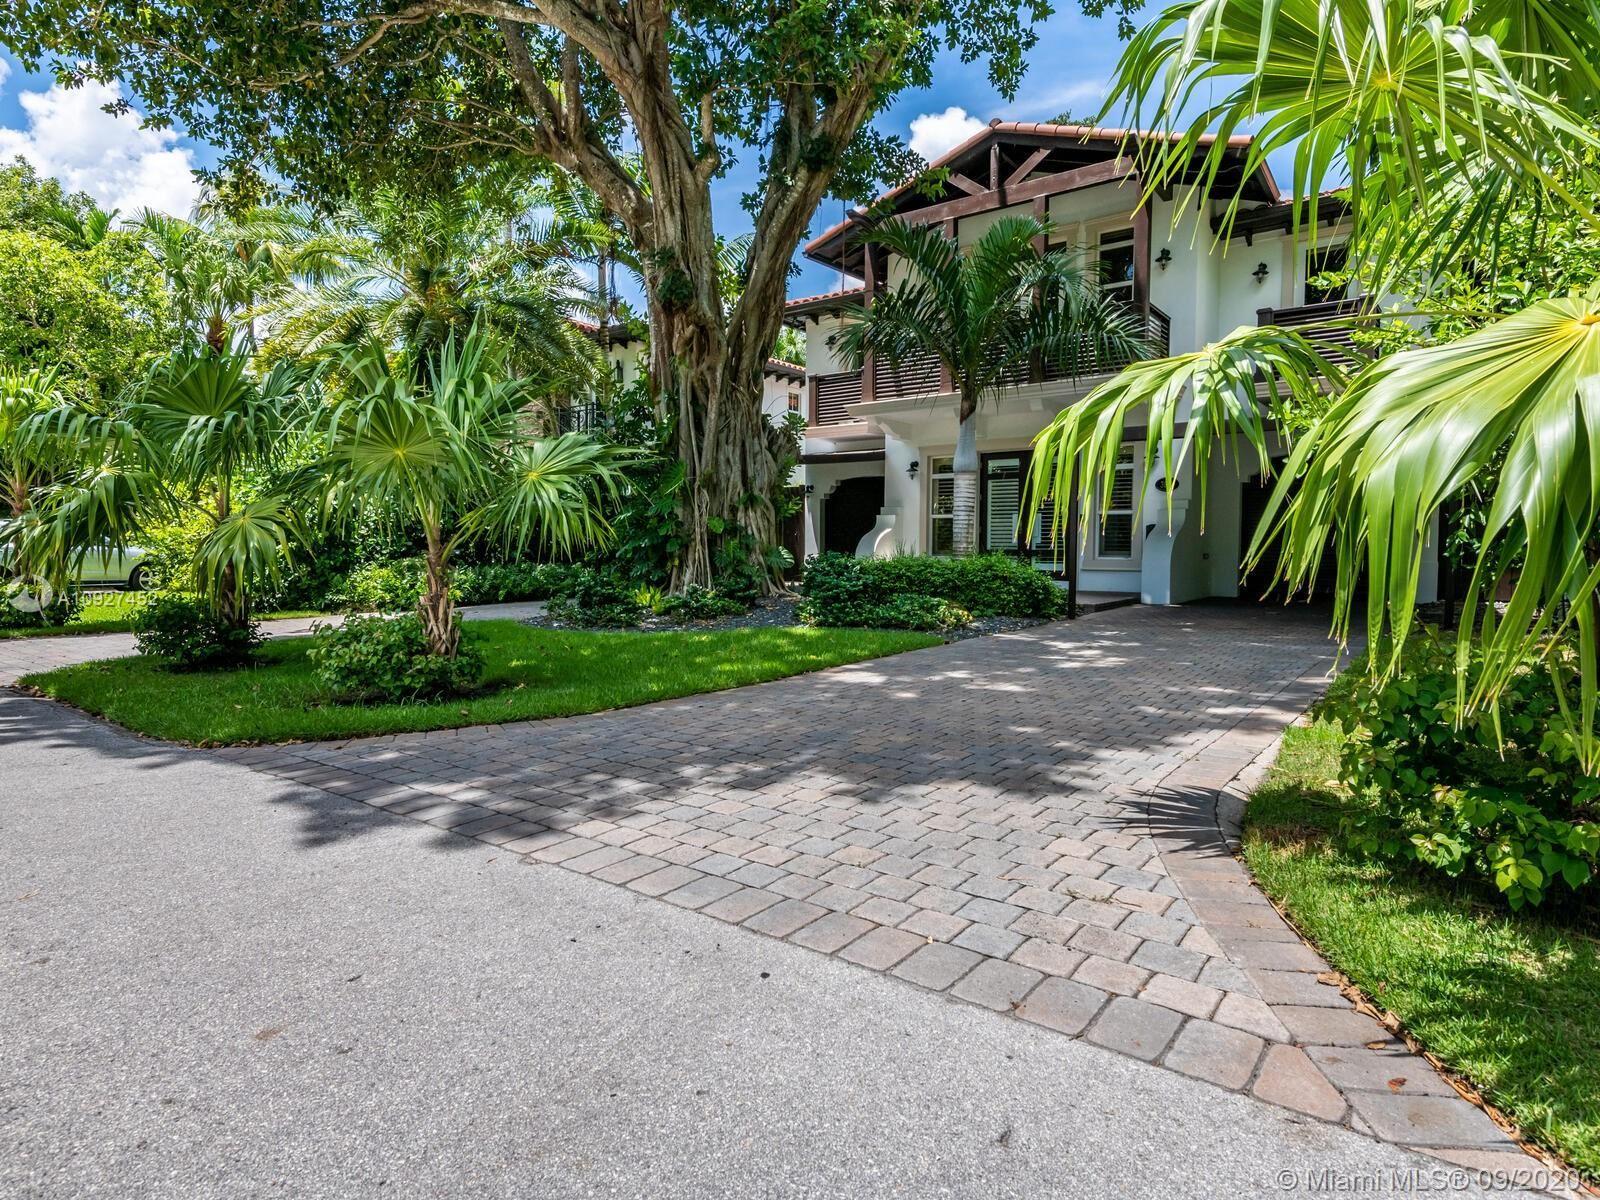 3801 Crawford Ave, Miami, FL 33133 - #: A10927452